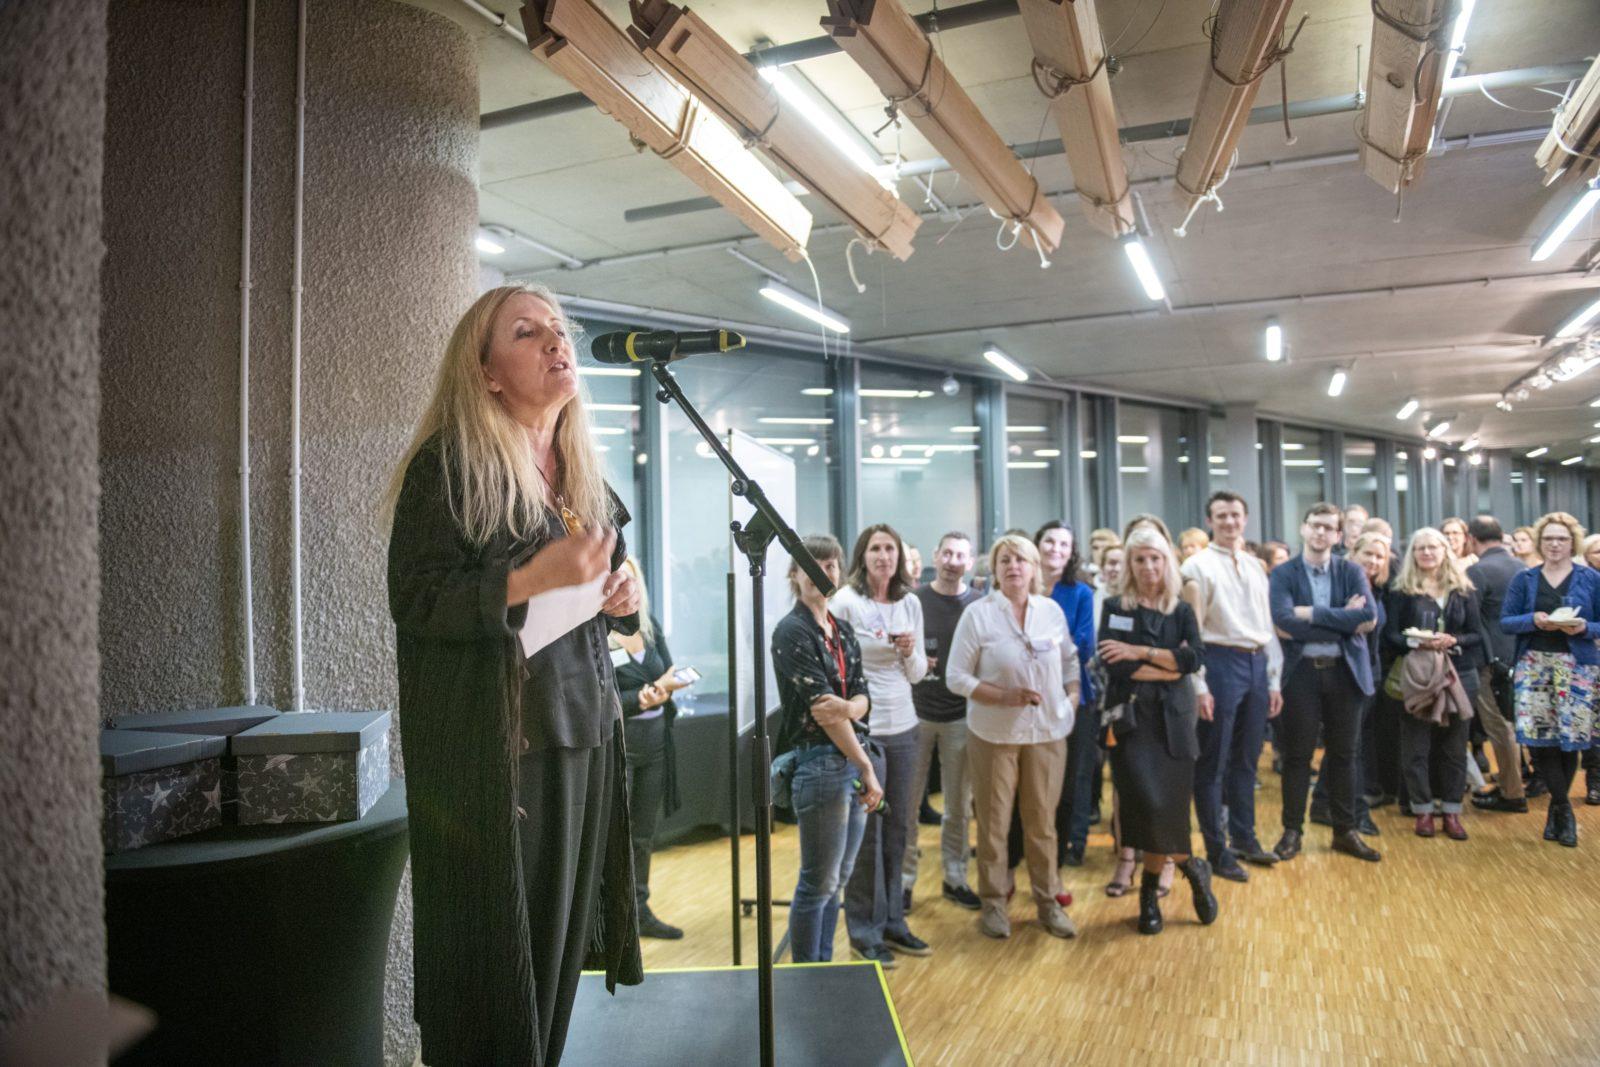 Warschau_2019_Empfang_reception_Thursday_Warsaw_Stasiuk_Konrad_084